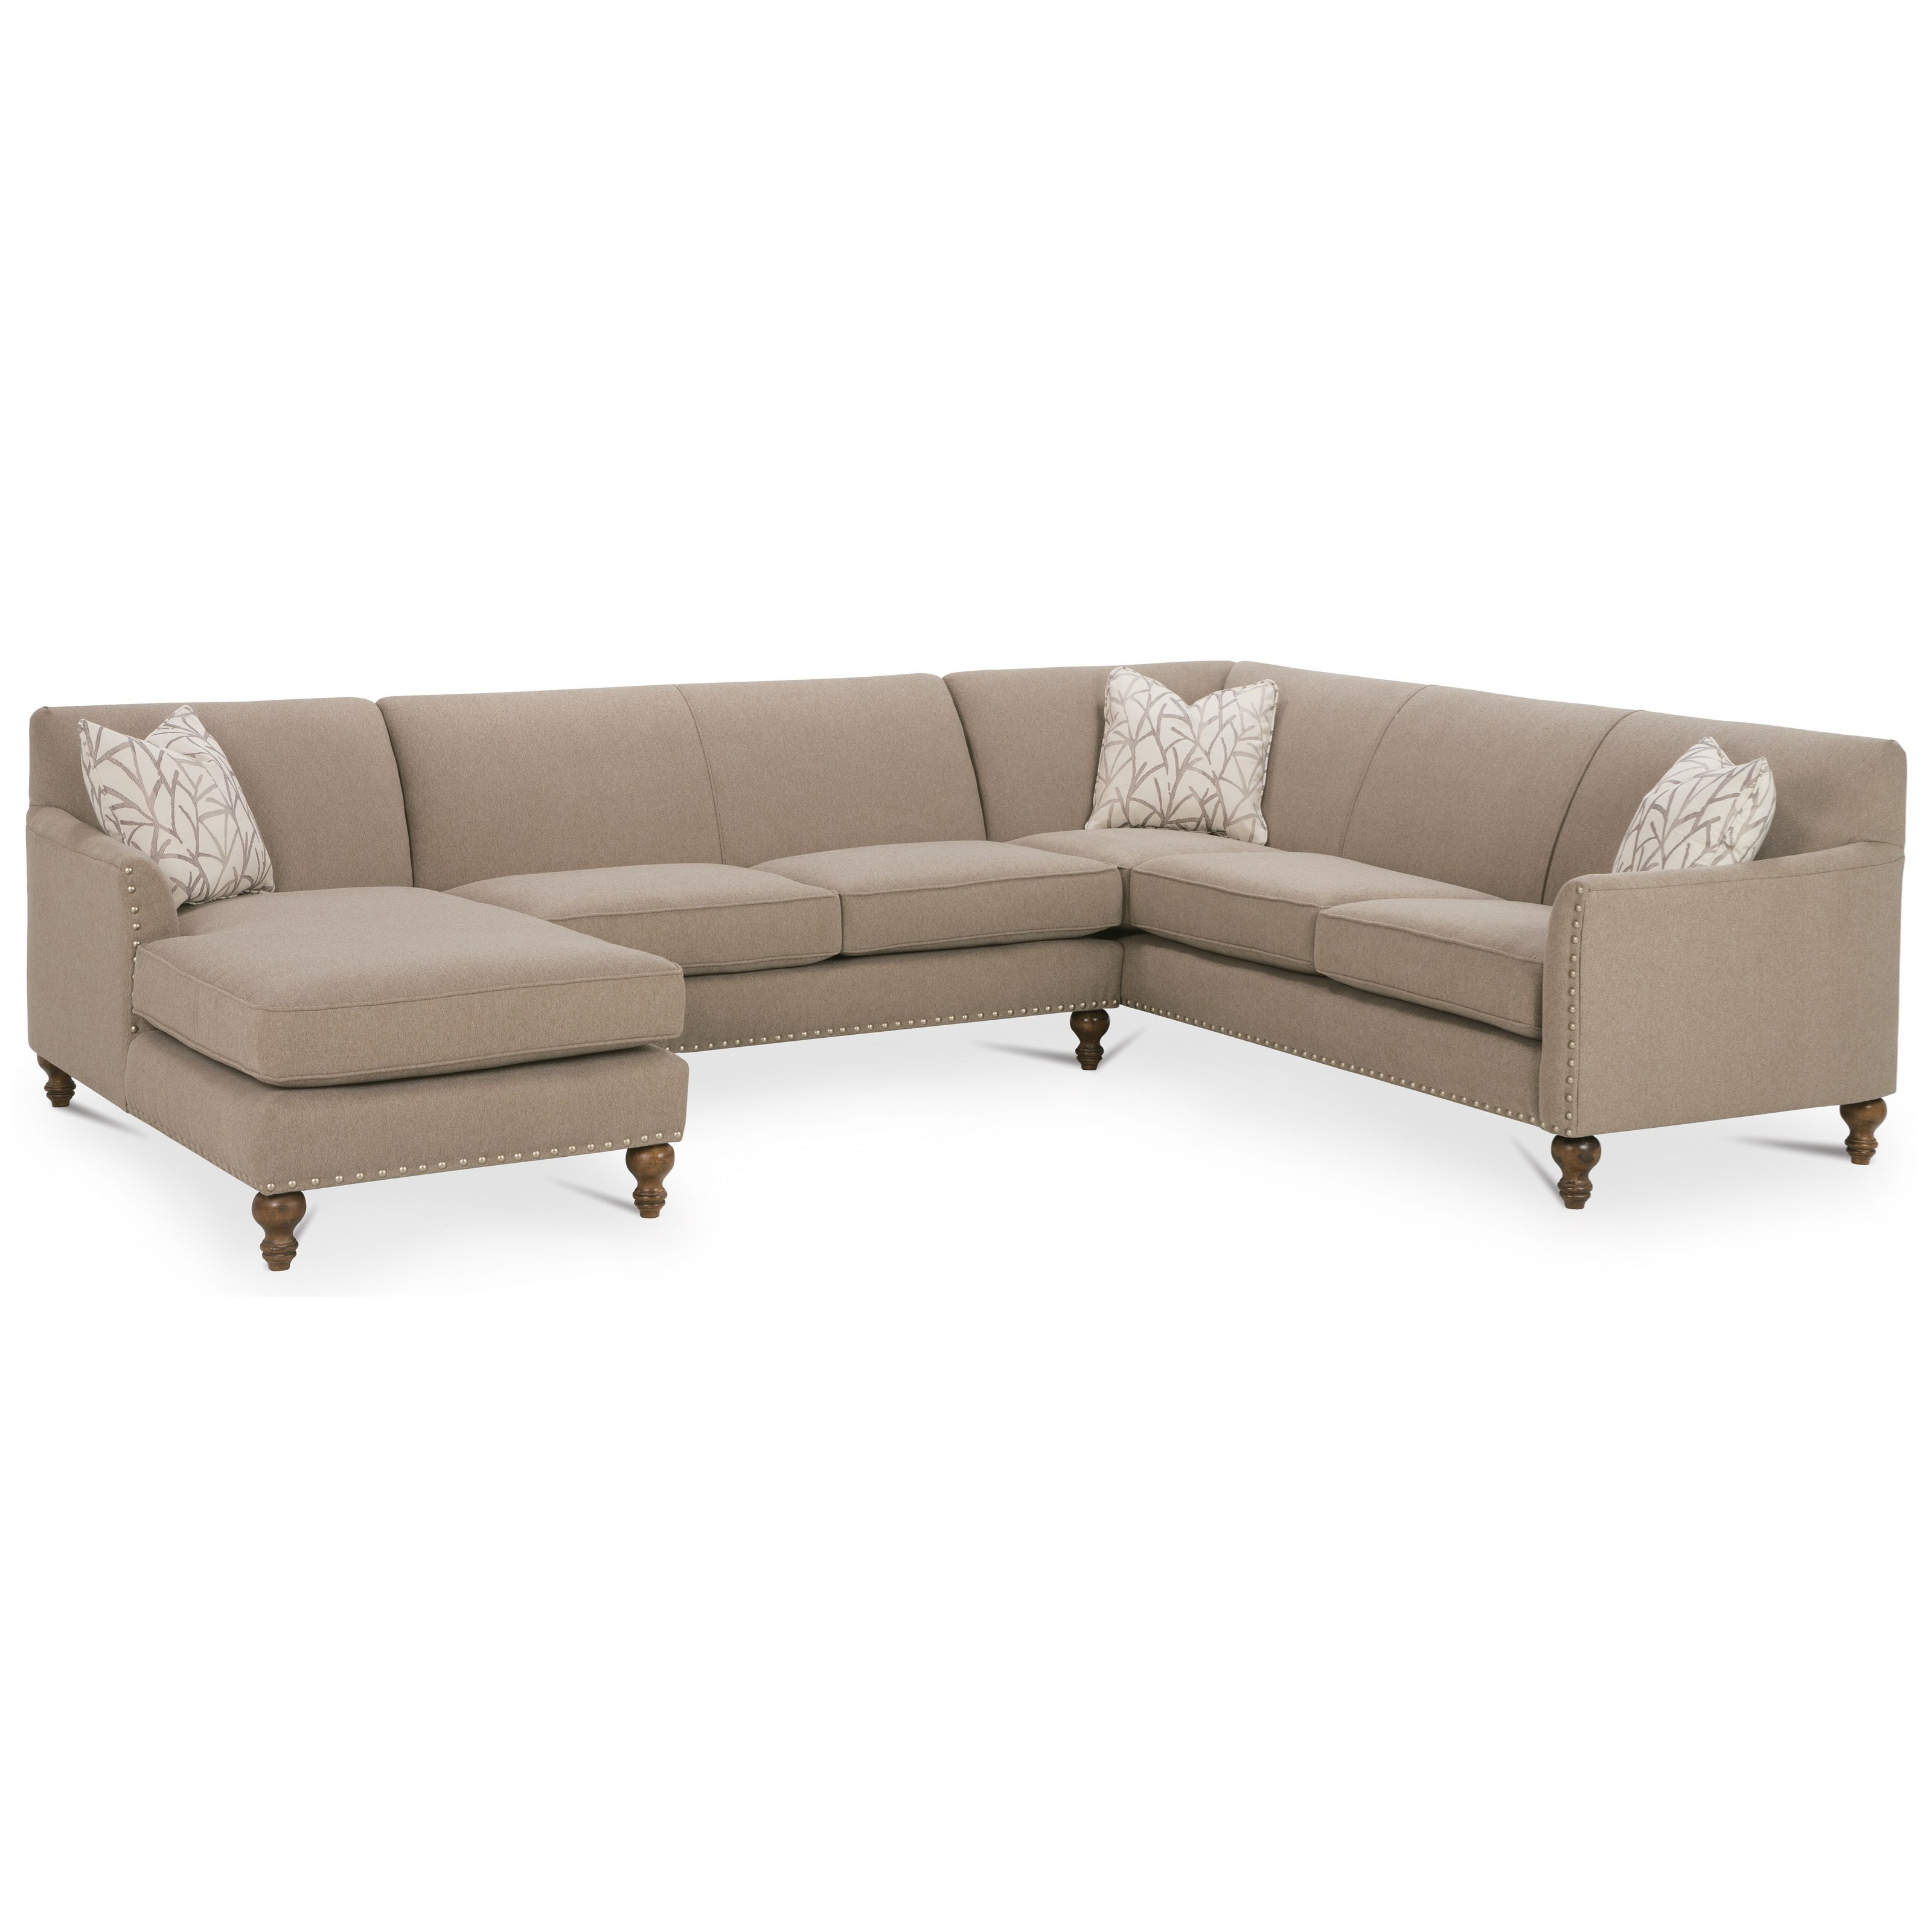 rowe varick rxo customizable 3 piece sectional sofa w raf. Black Bedroom Furniture Sets. Home Design Ideas